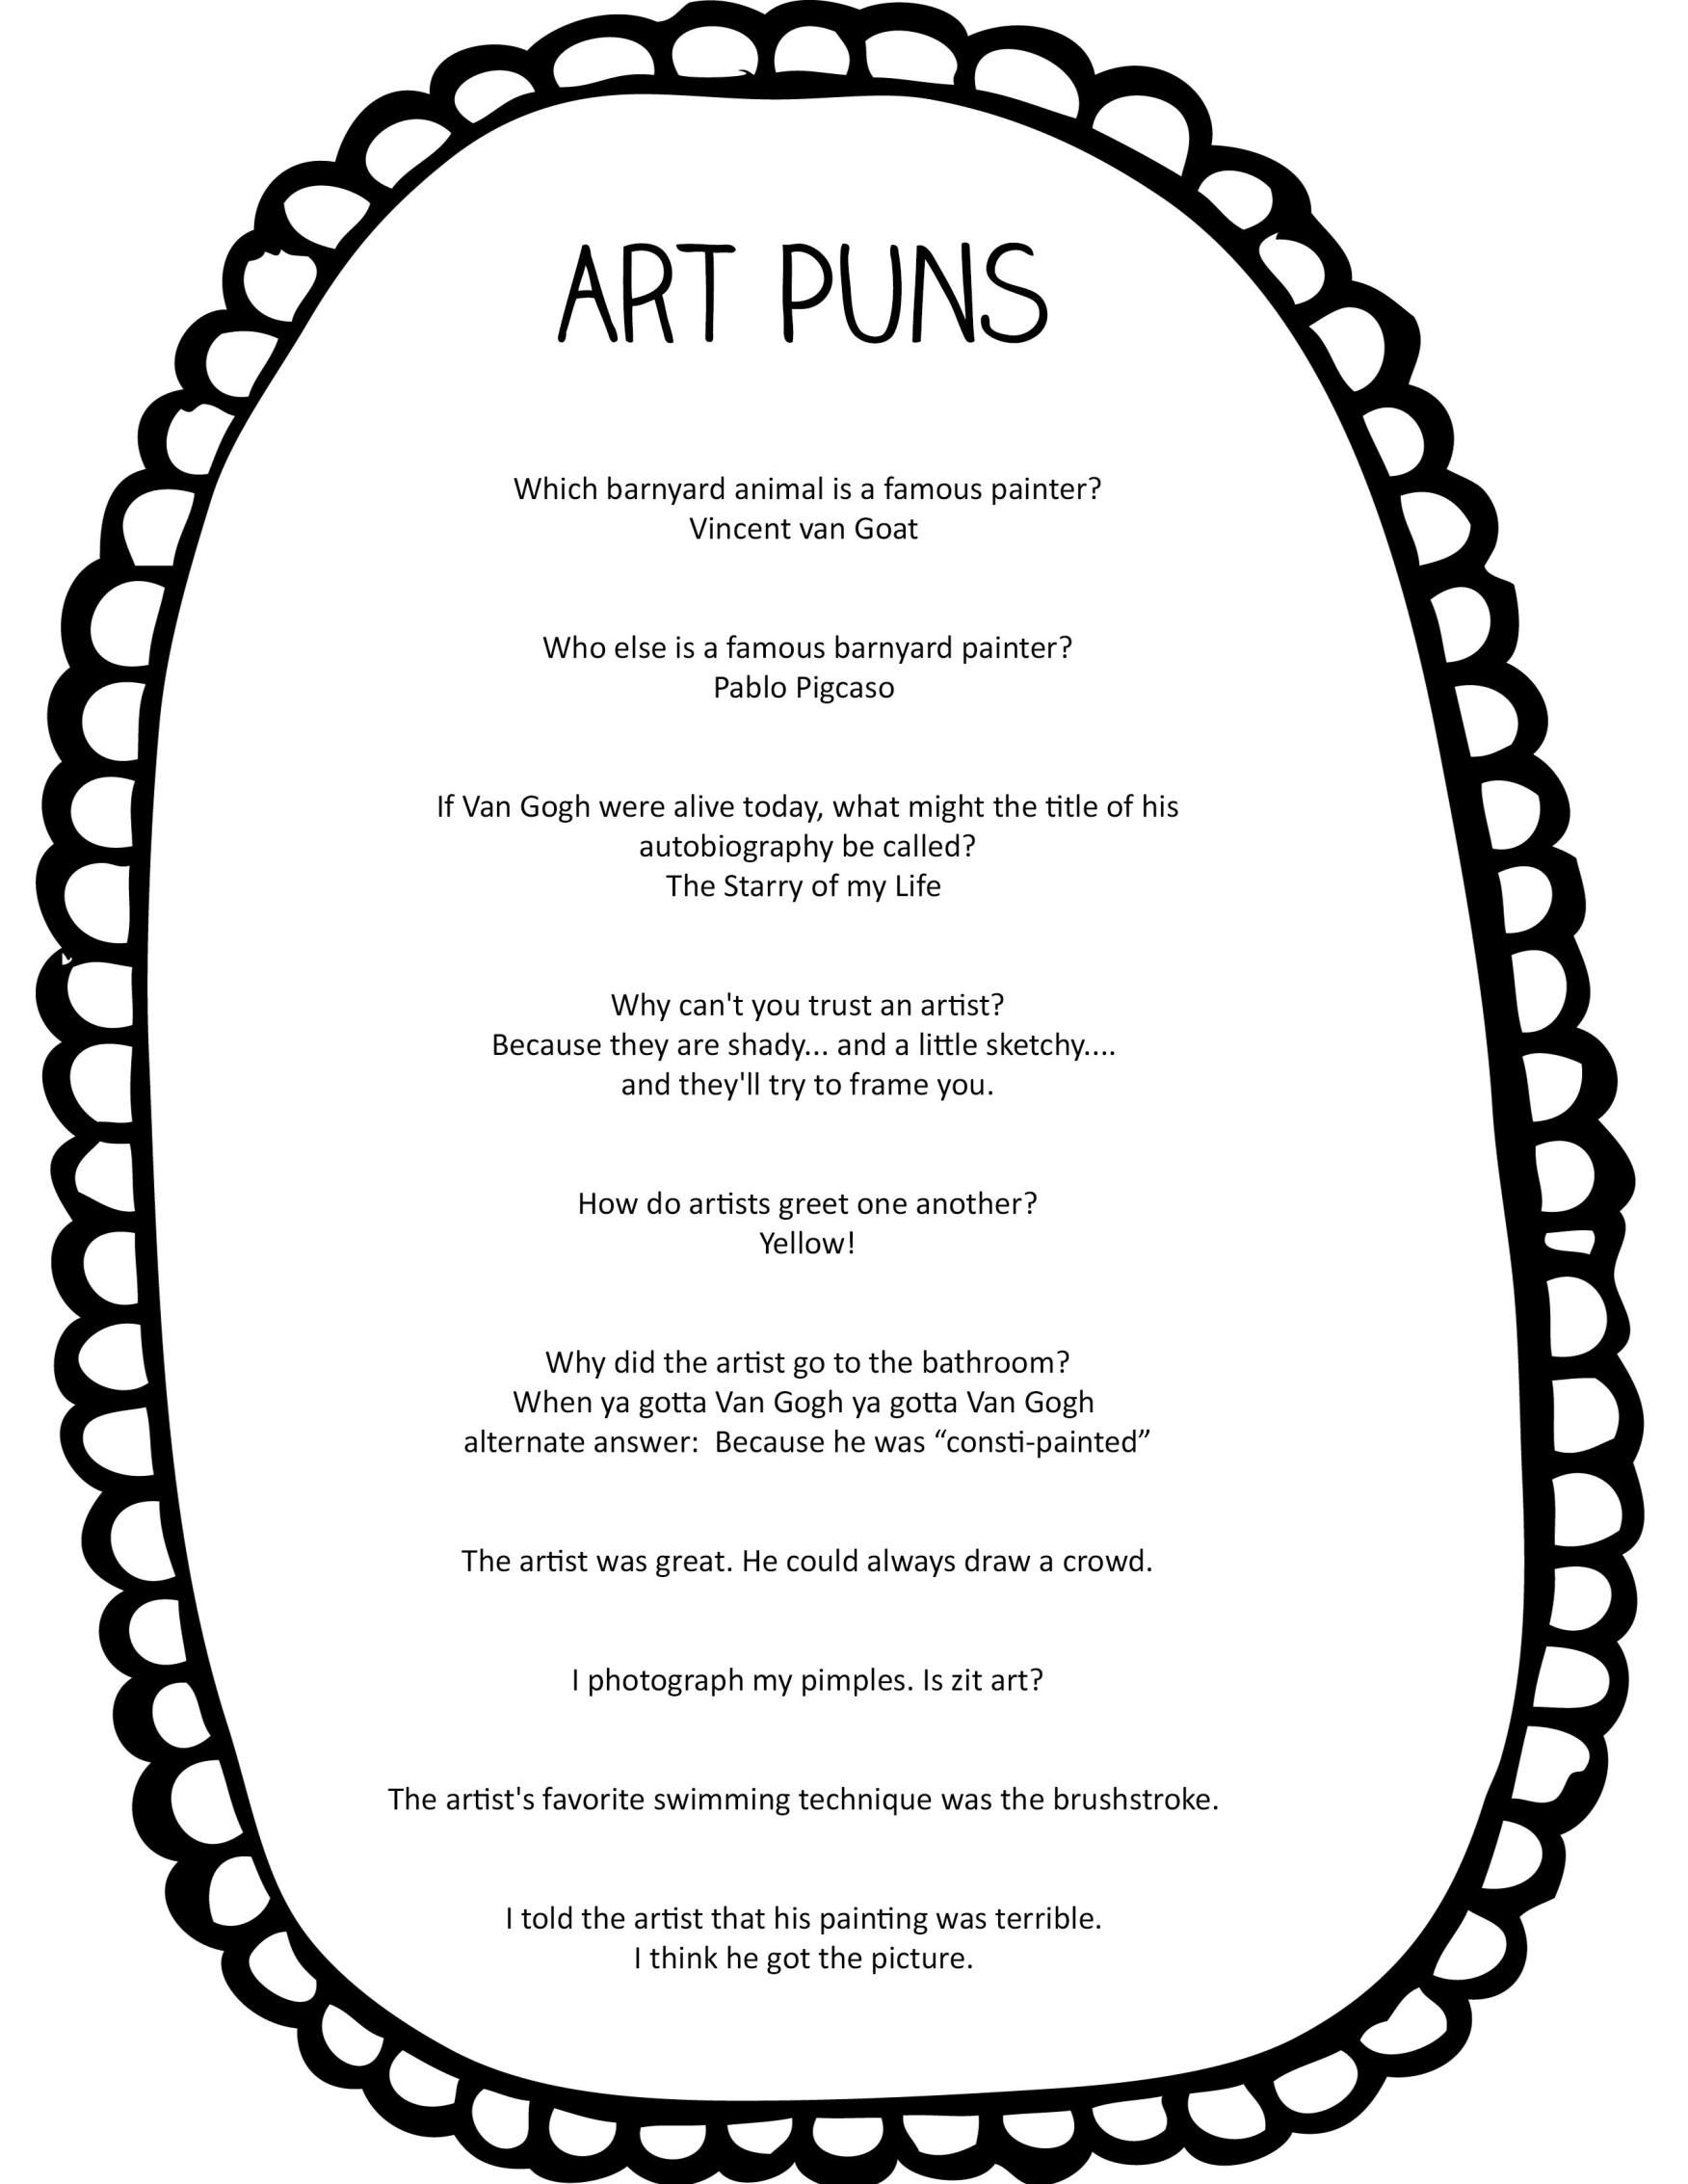 Fun Puns About Art And Artists